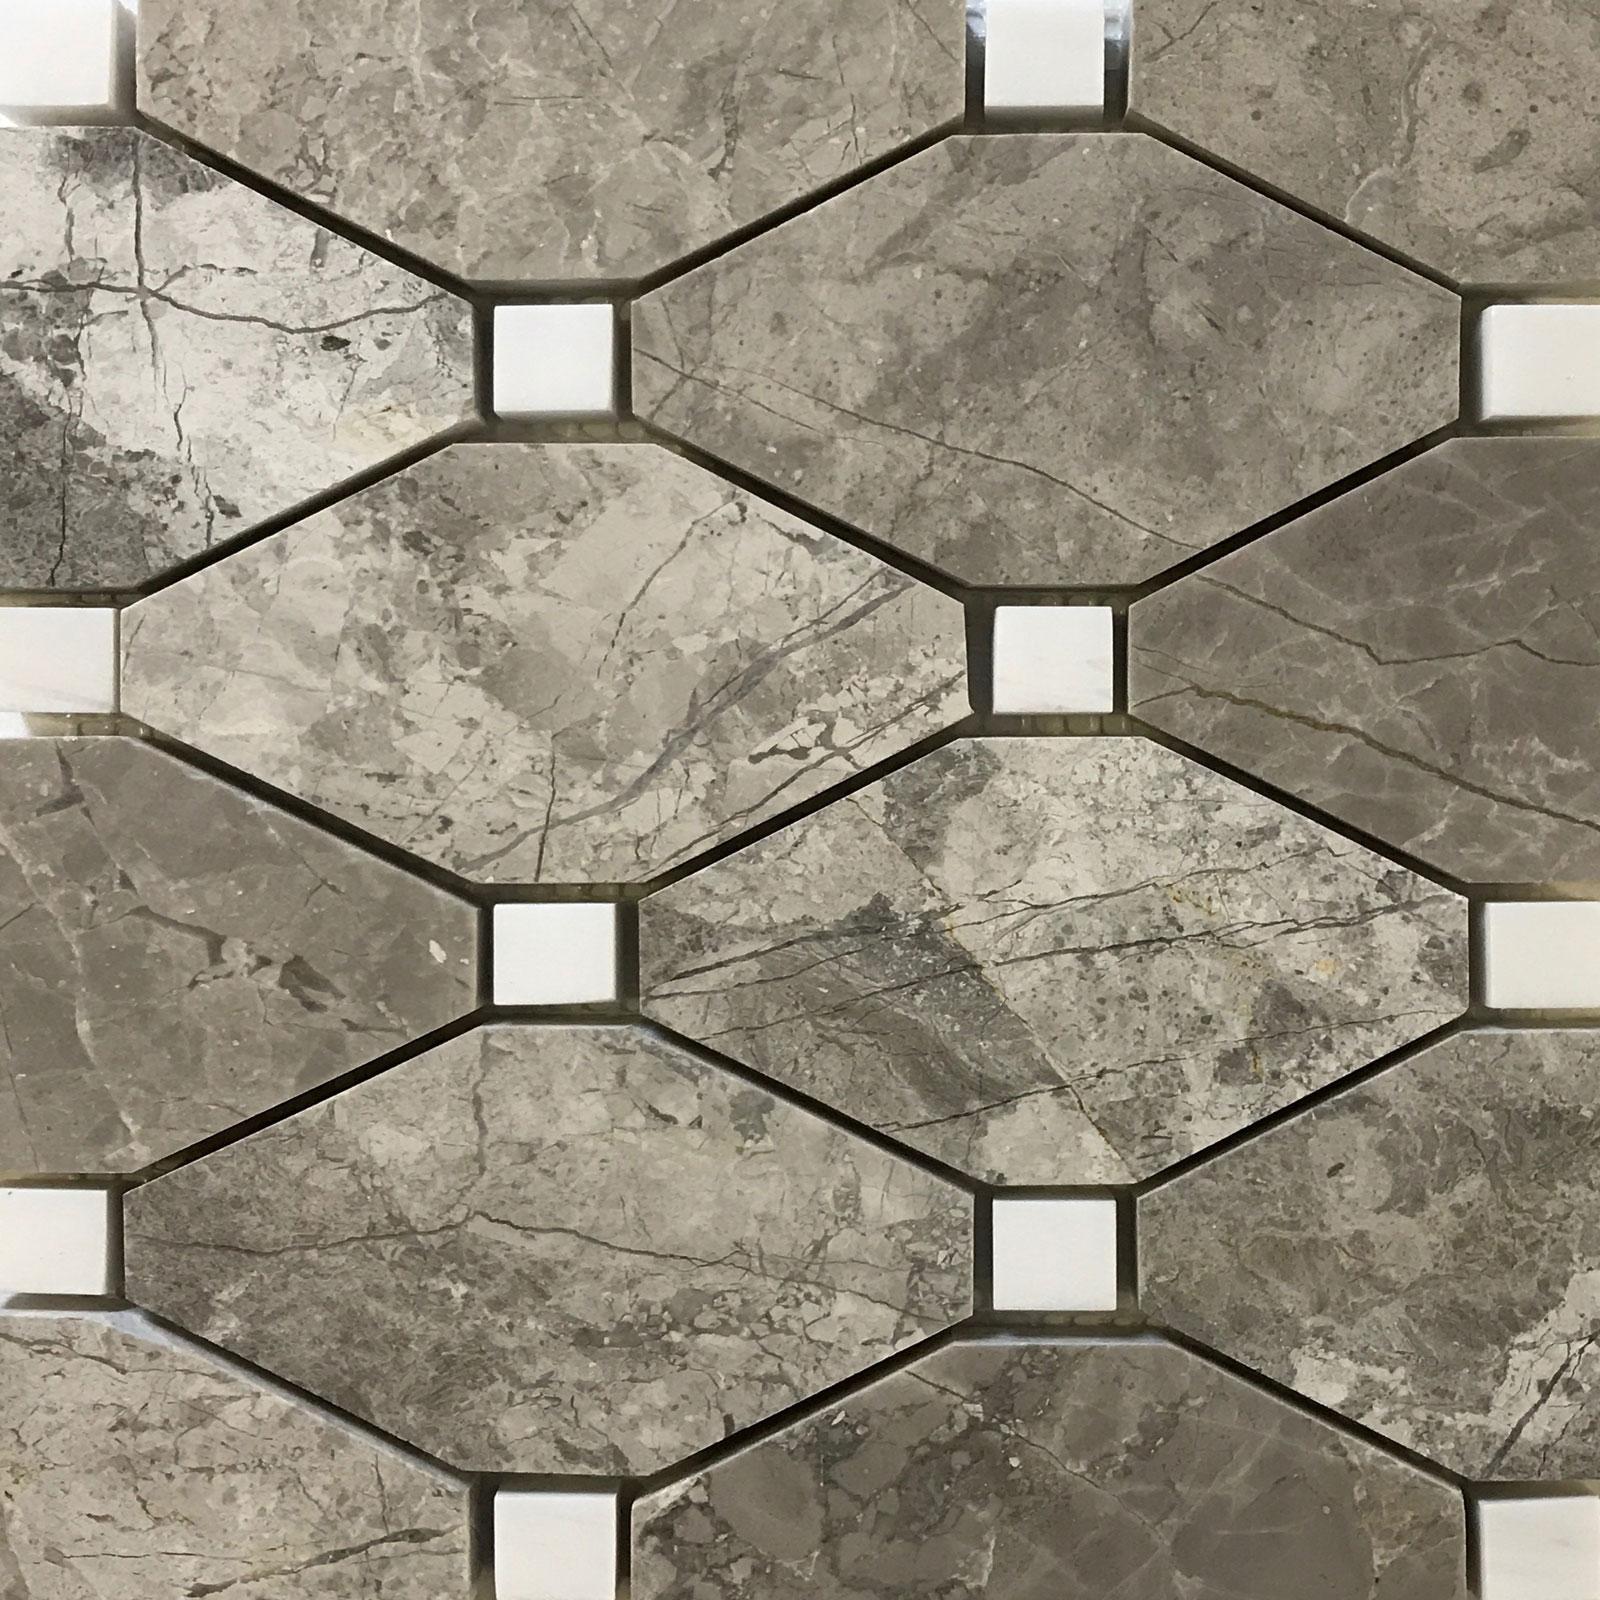 Shades Of Gray Flooring : Boliche mosaic tile shades of grey dolomite marble polished